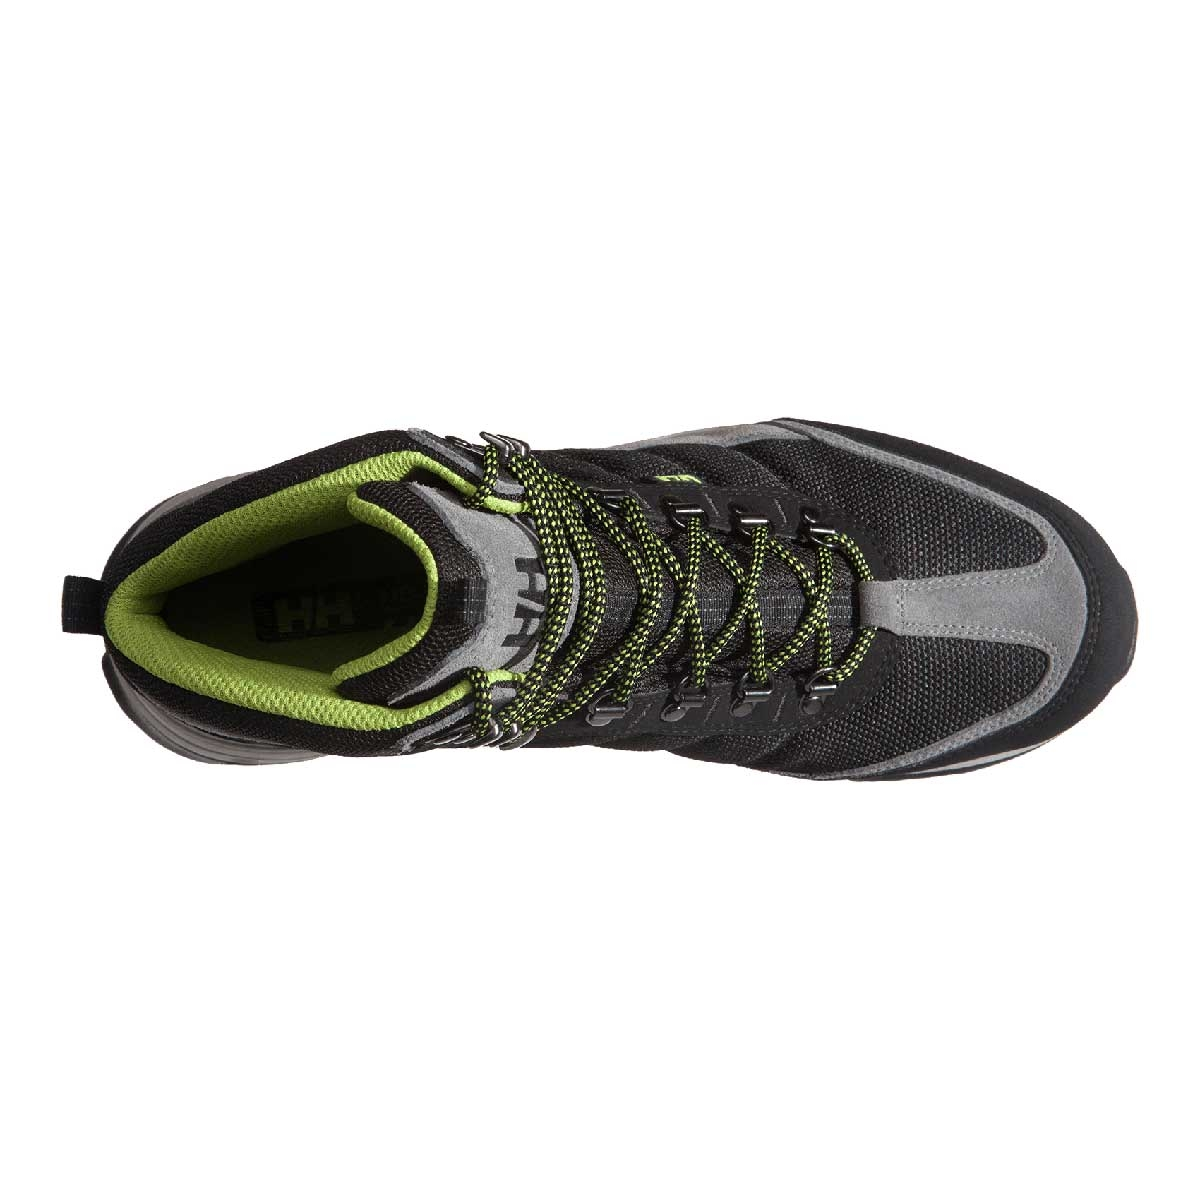 64dc10e44a ... Image of Helly Hansen Rapide Mid Mesh HT Walking Boots - Black/Ebony/Rusty  ...